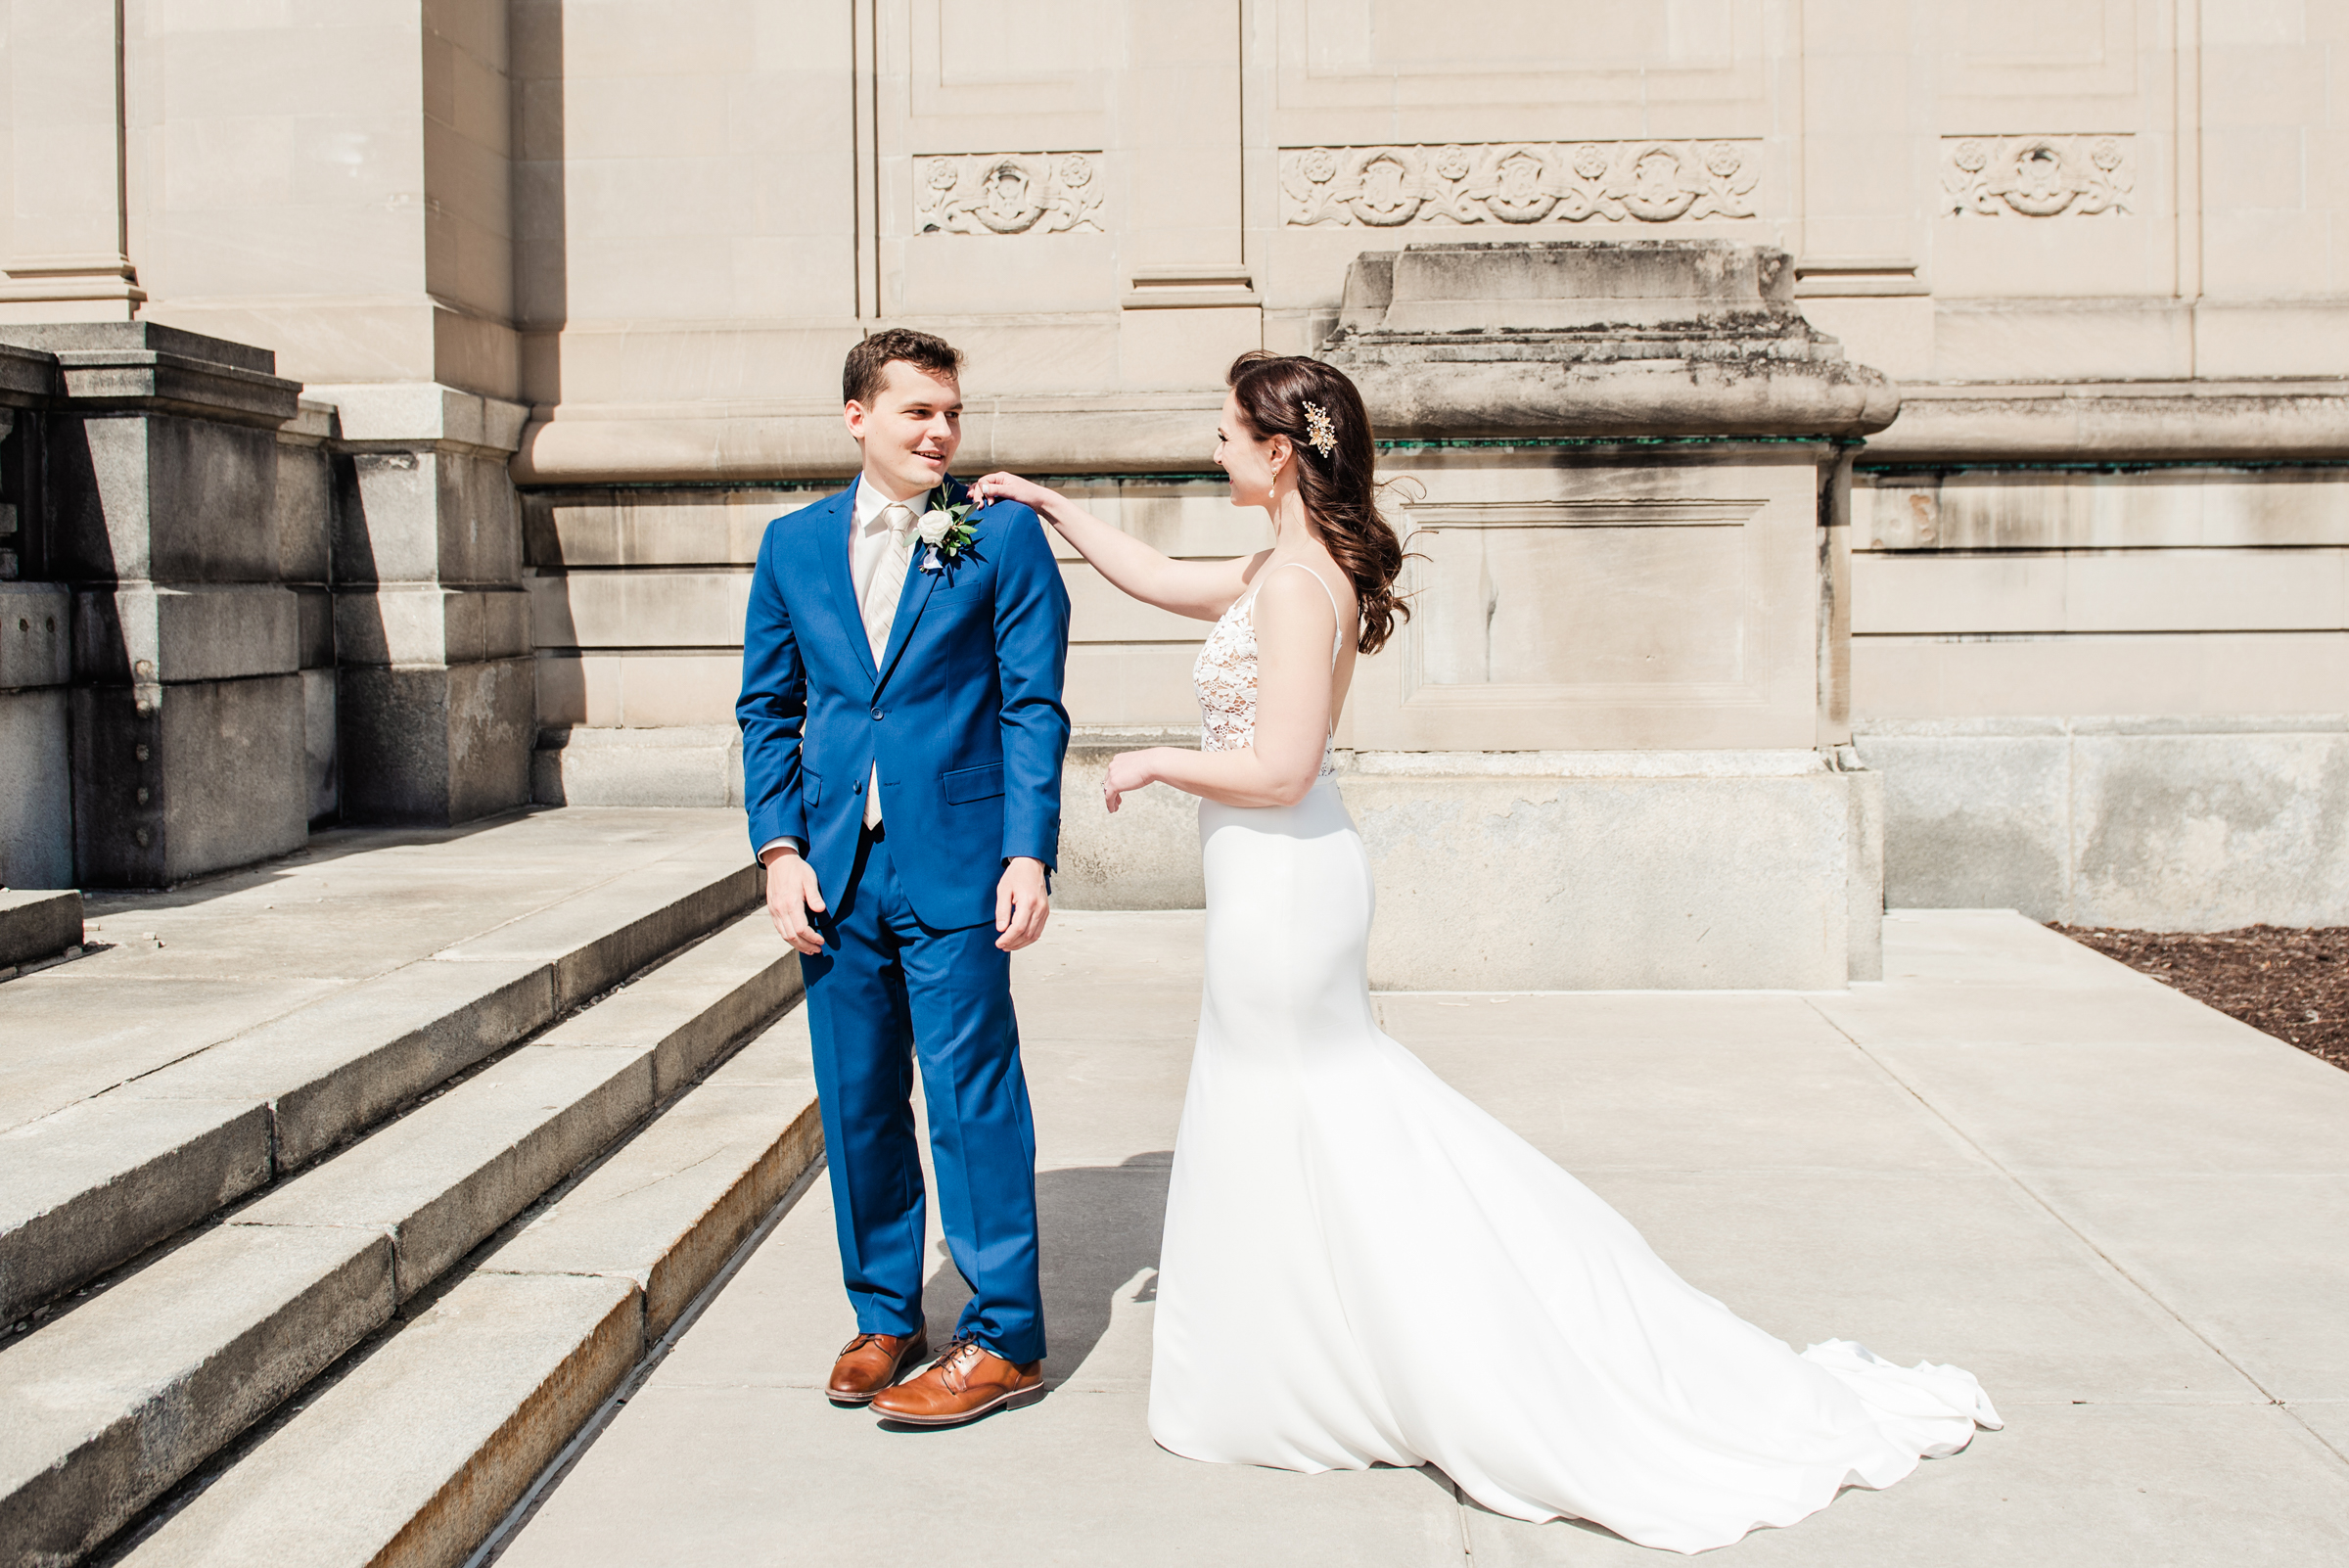 The_Arbor_LoftRochester_Wedding_JILL_STUDIO_Rochester_NY_Photographer_144032.jpg